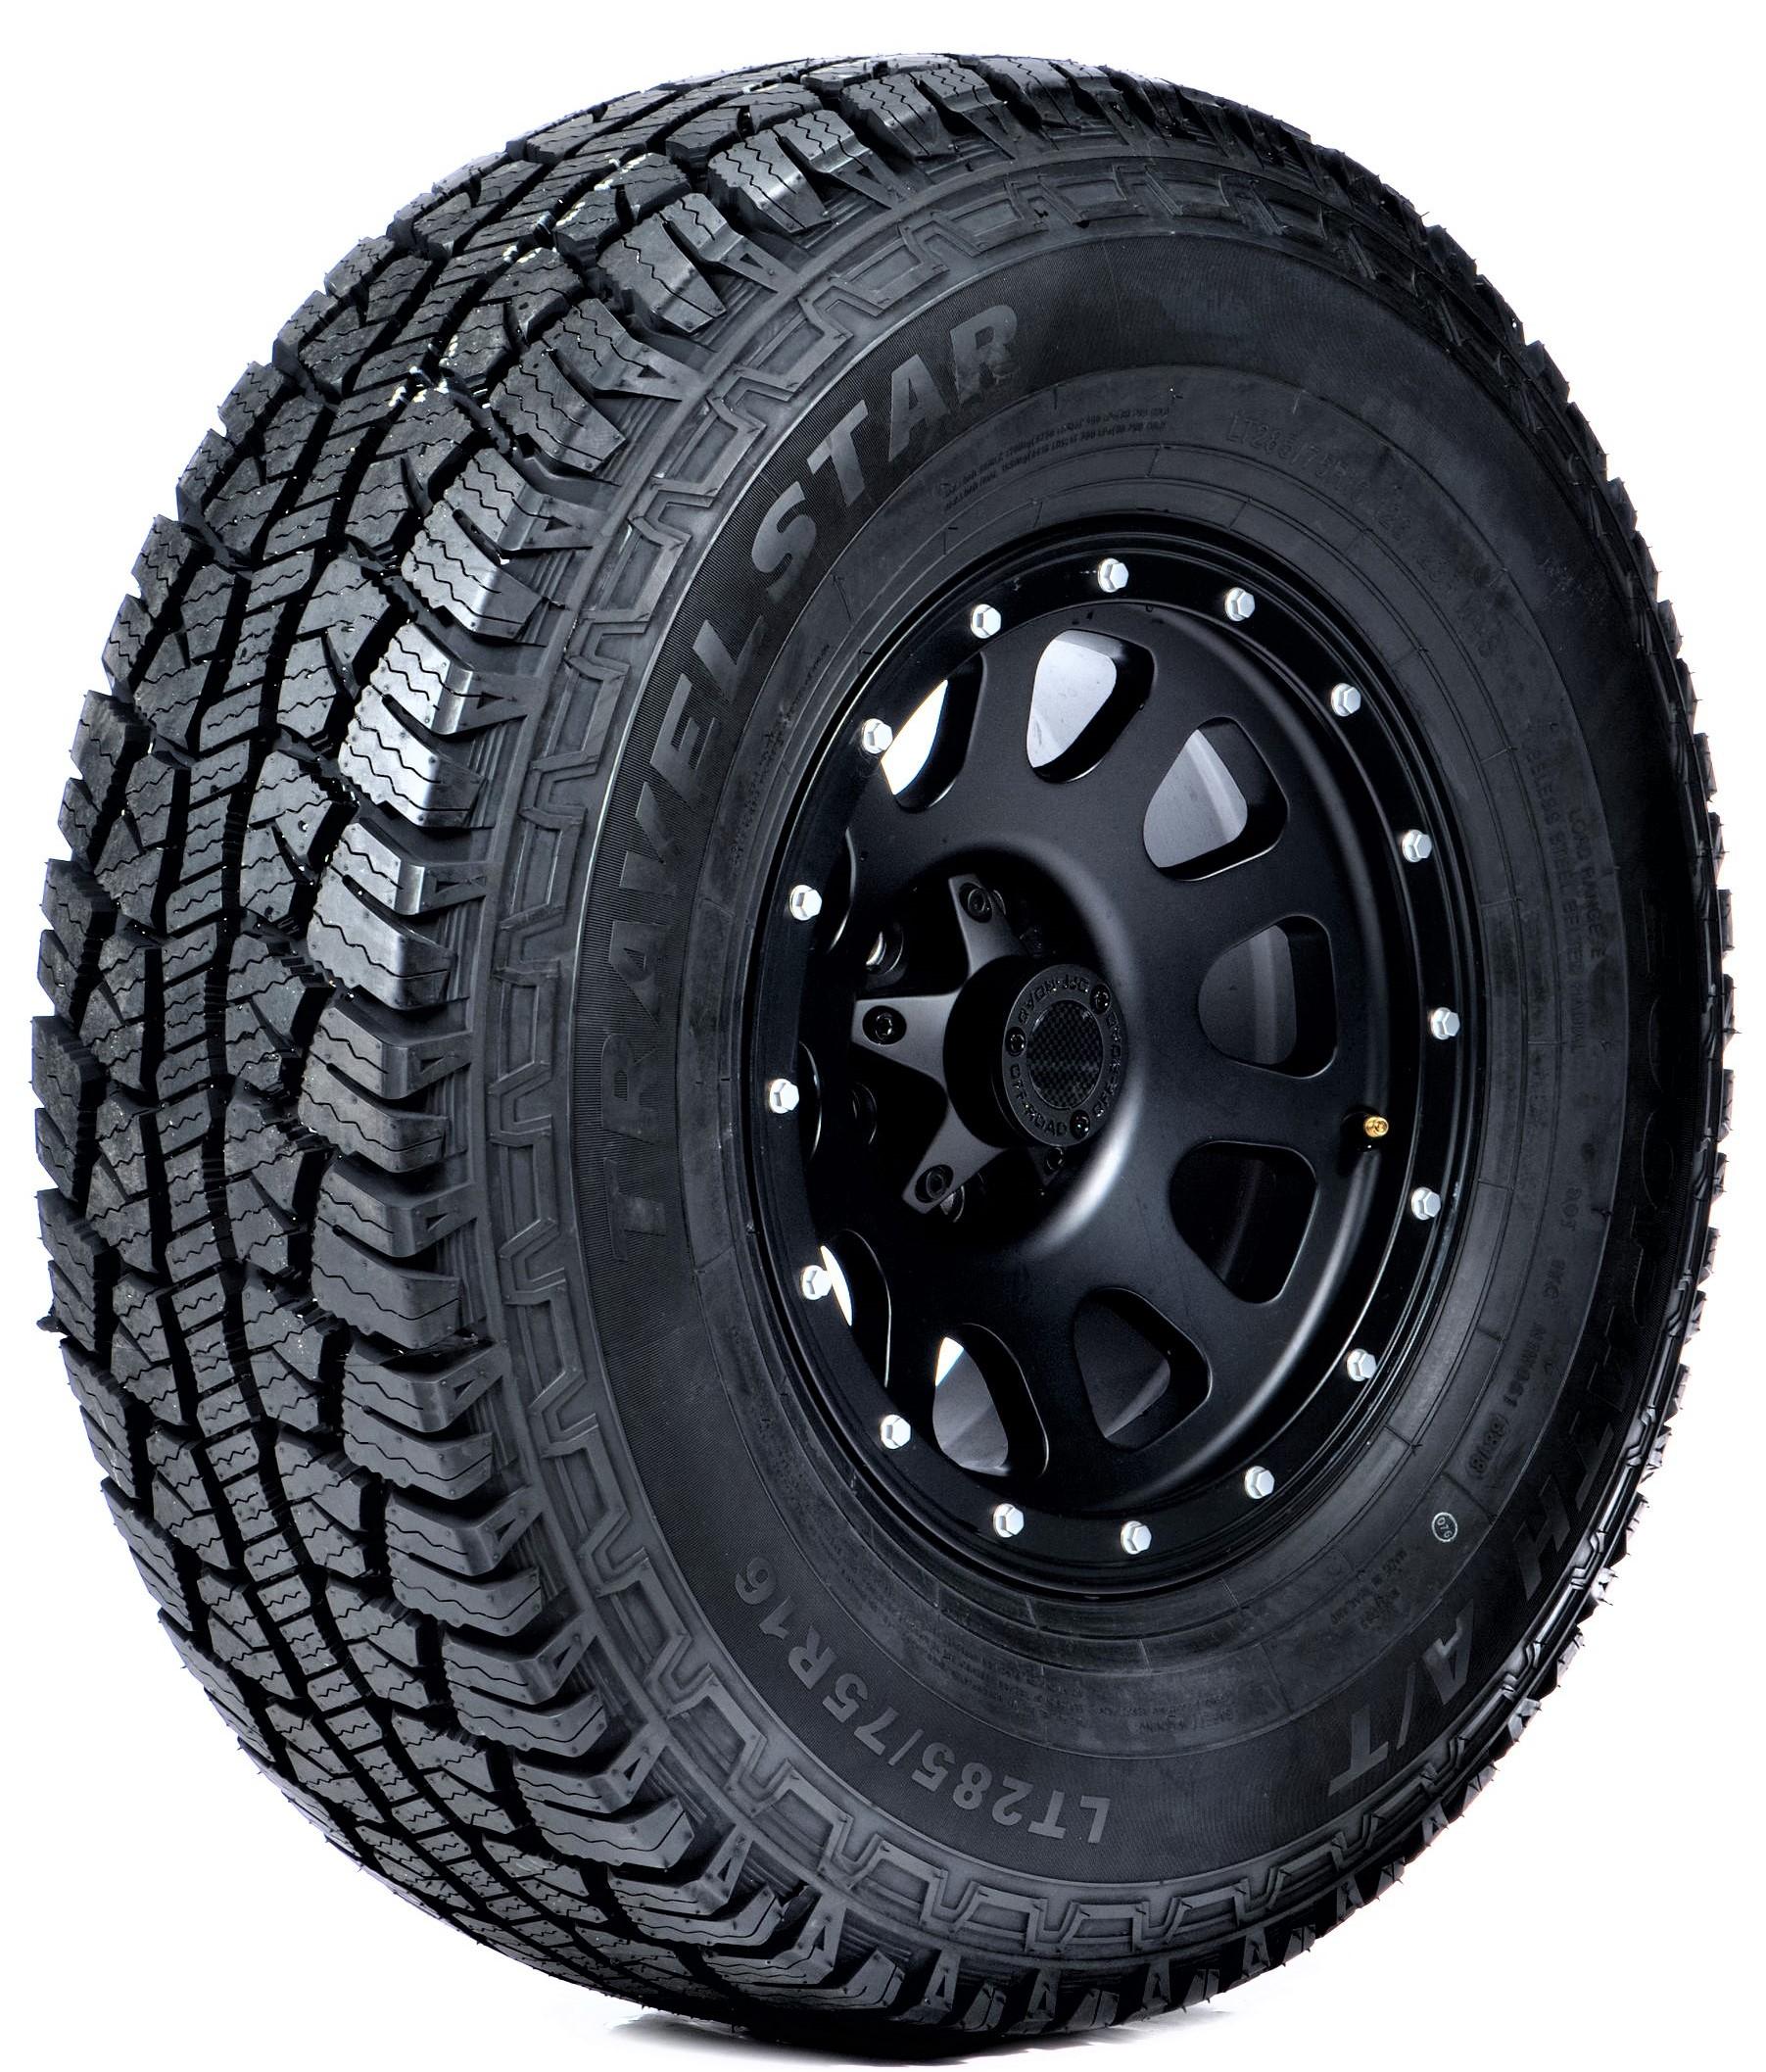 All Terrain Tires >> Details About 4 New Travelstar Ecopath A T All Terrain Tires 245 65r17 107t